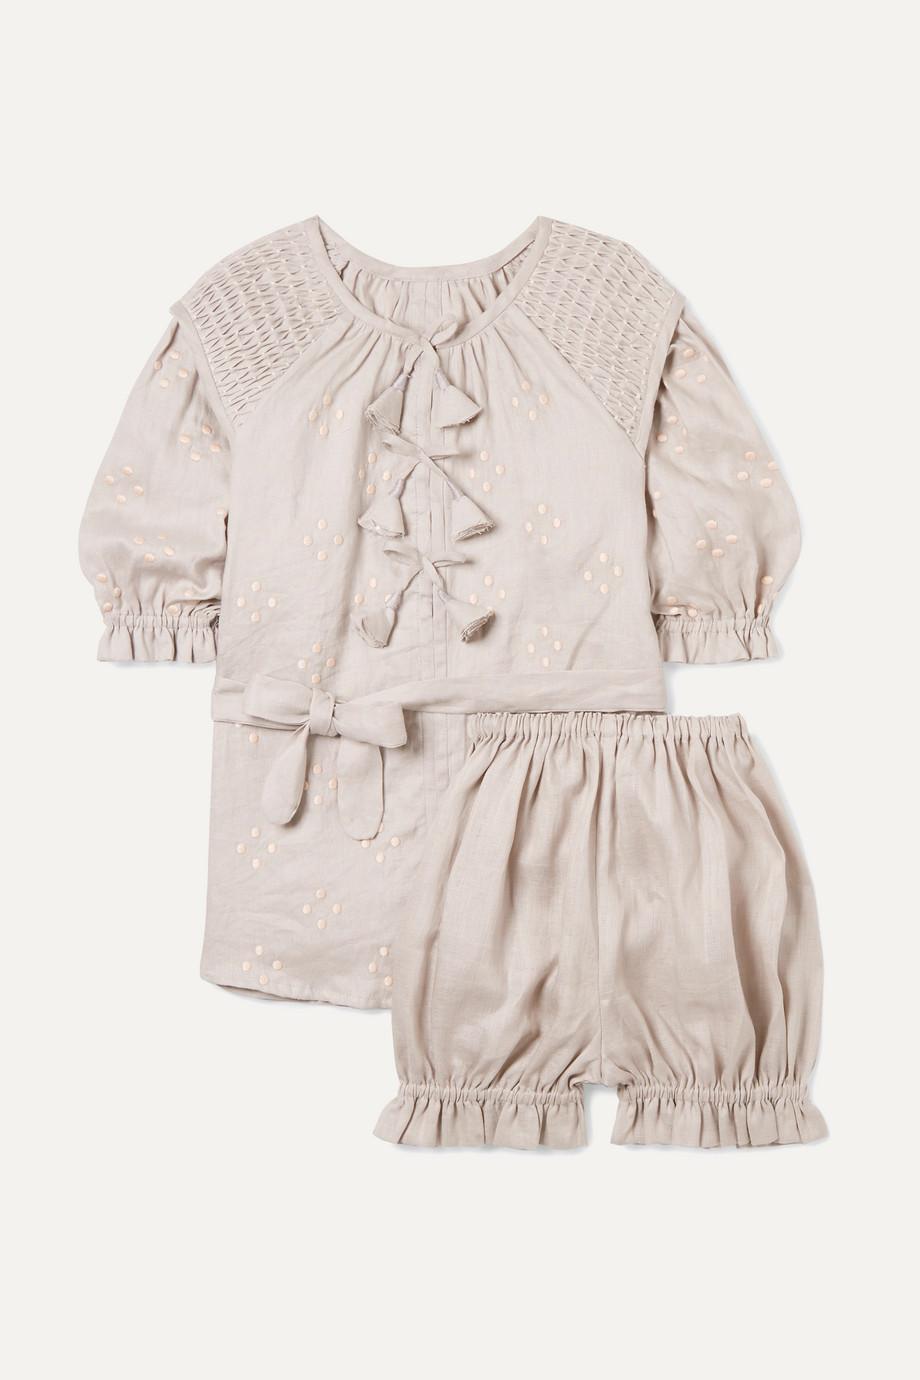 Innika Choo Kids Smocked embroidered linen dress and bloomers set